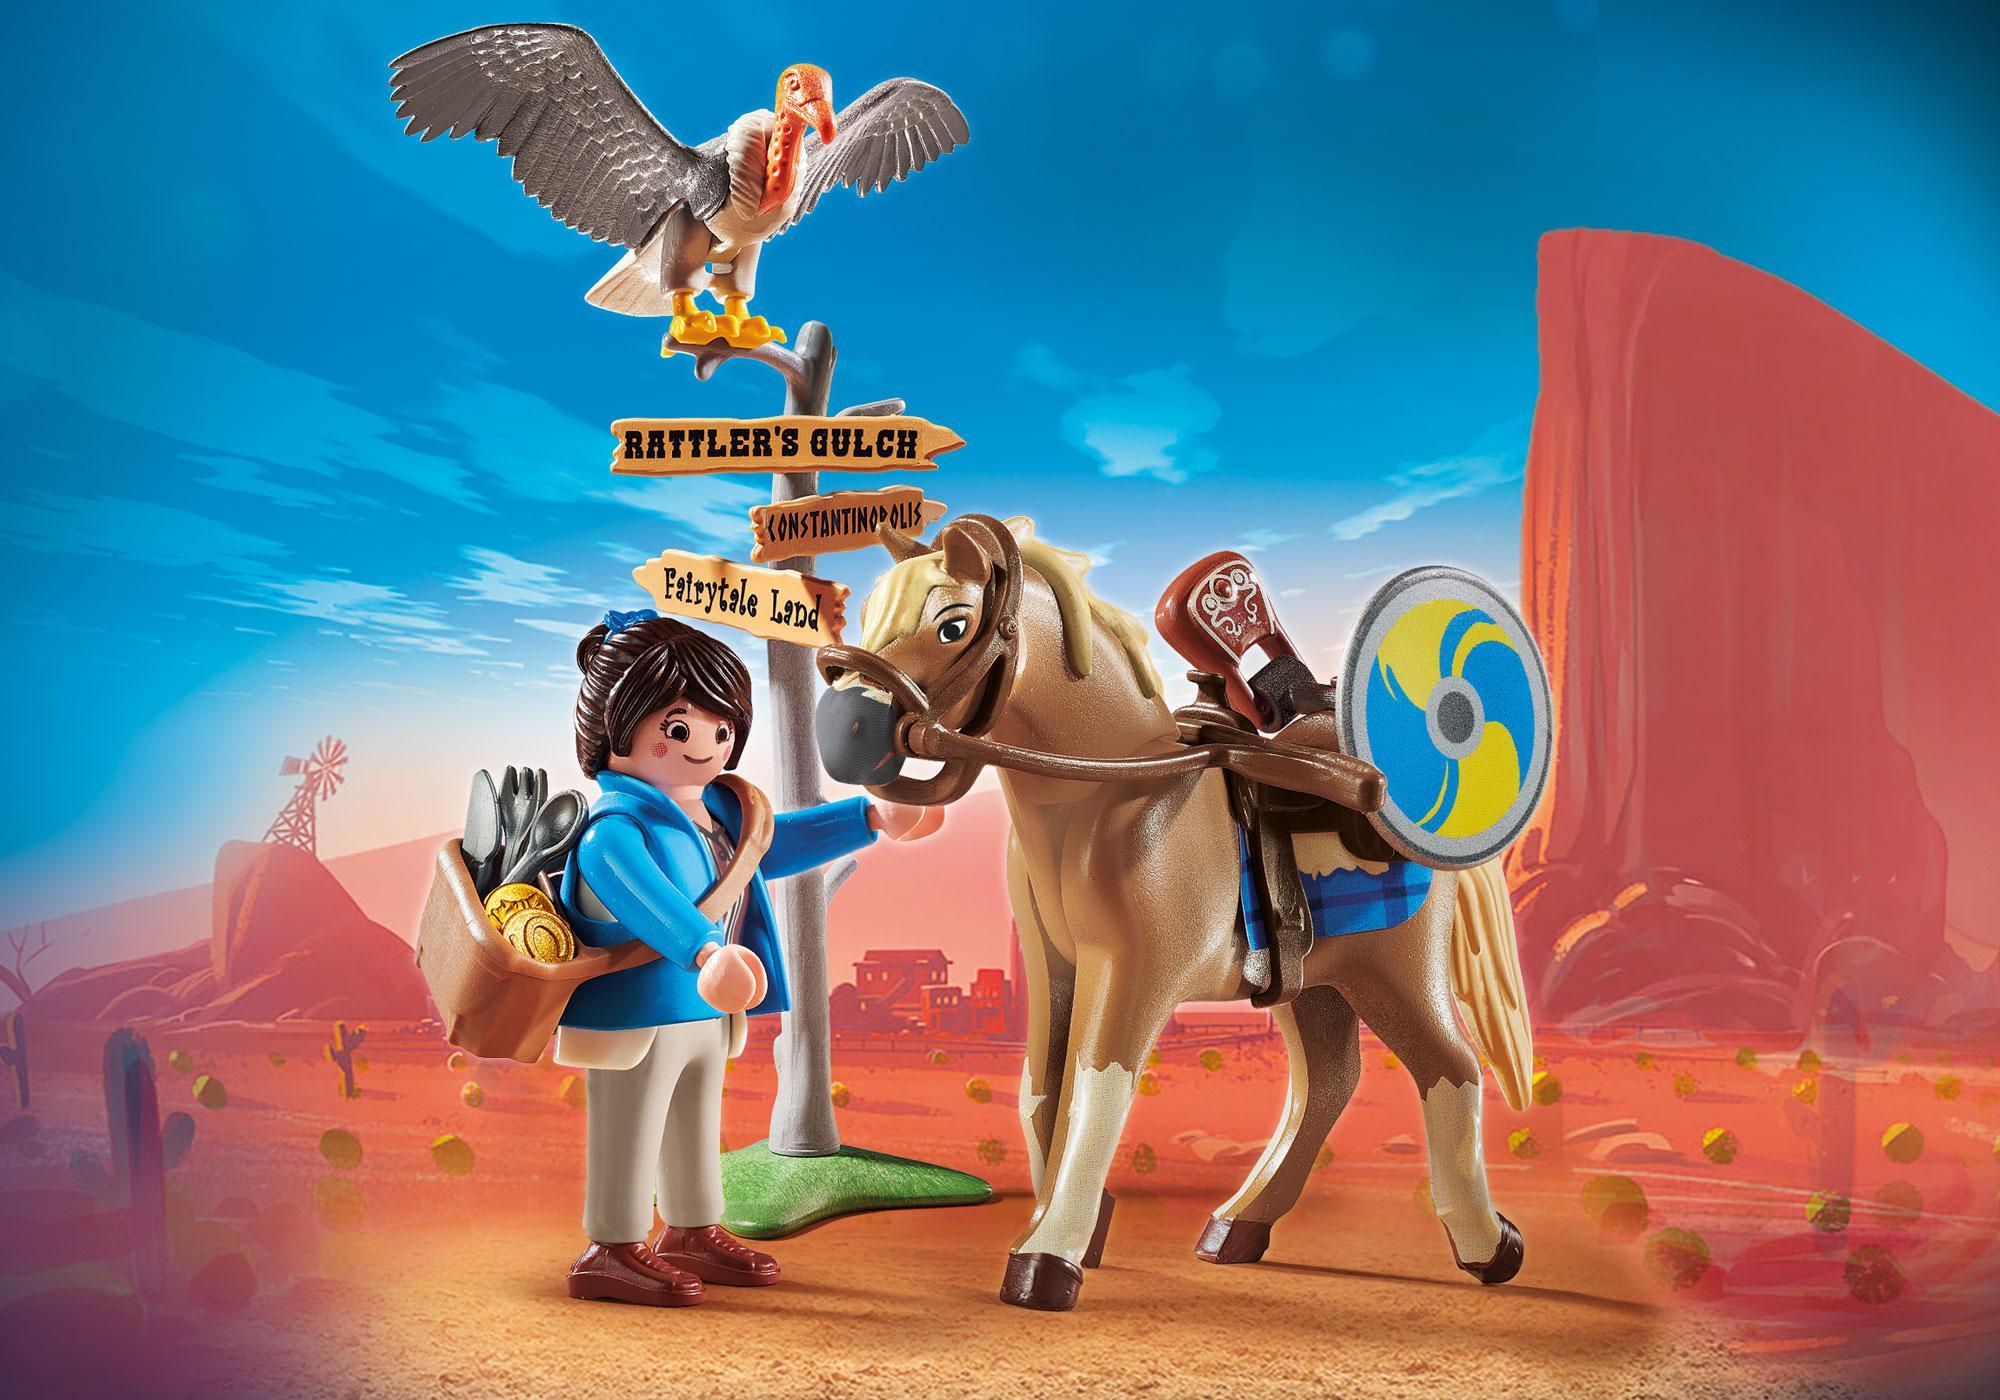 http://media.playmobil.com/i/playmobil/70072_product_detail/PLAYMOBIL: THE MOVIE Marla con Caballo